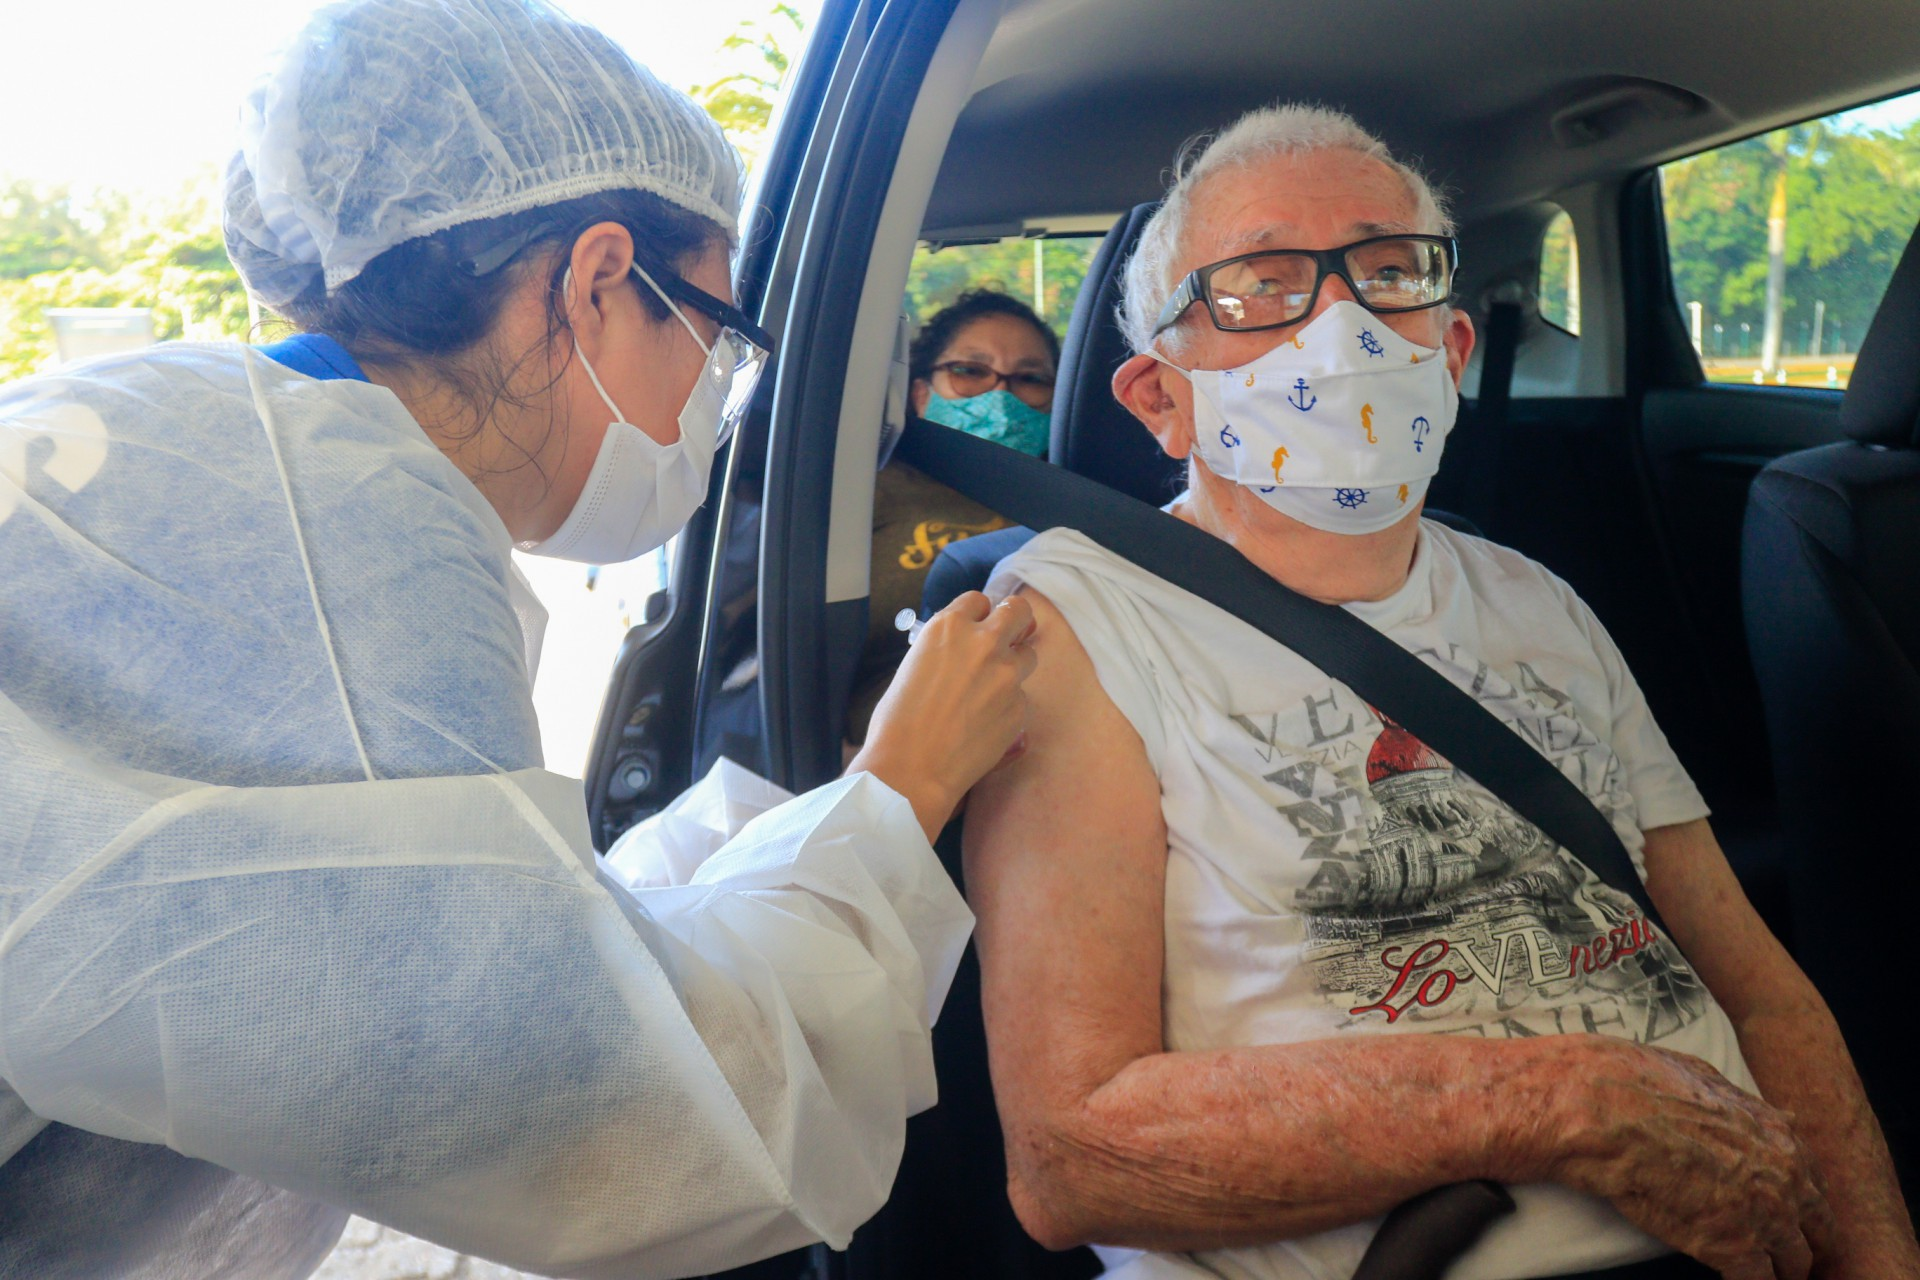 FORTALEZA, CE, 02-02-2021: Inicia-se na tarde de hoje a vacinacao de idosos por drive-thru no estacionamento do shopping Iguatemi.  (BARBARA MOIRA/ O POVO) (Foto: BARBARA MOIRA)